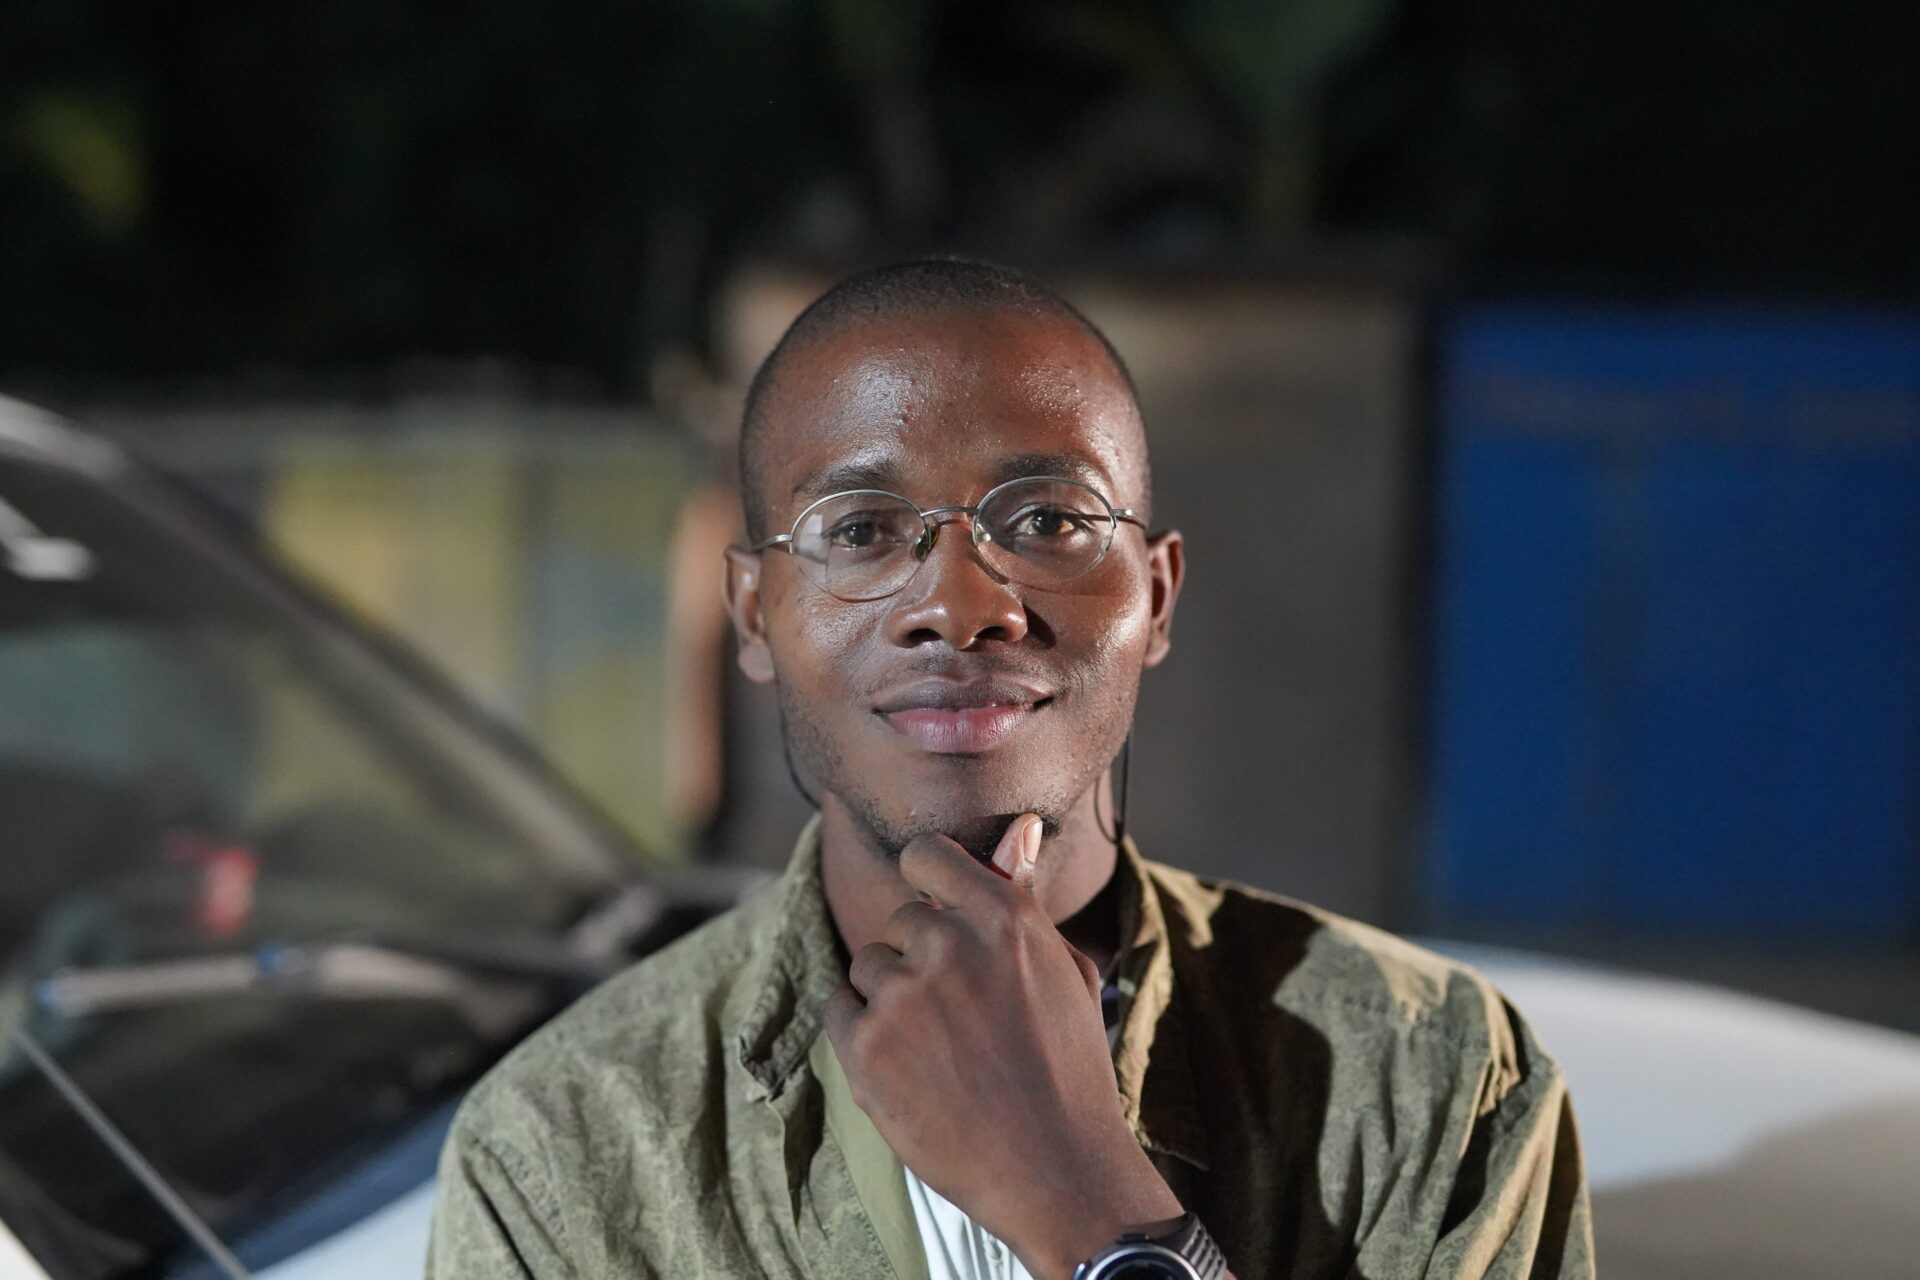 Haitian man Dodley